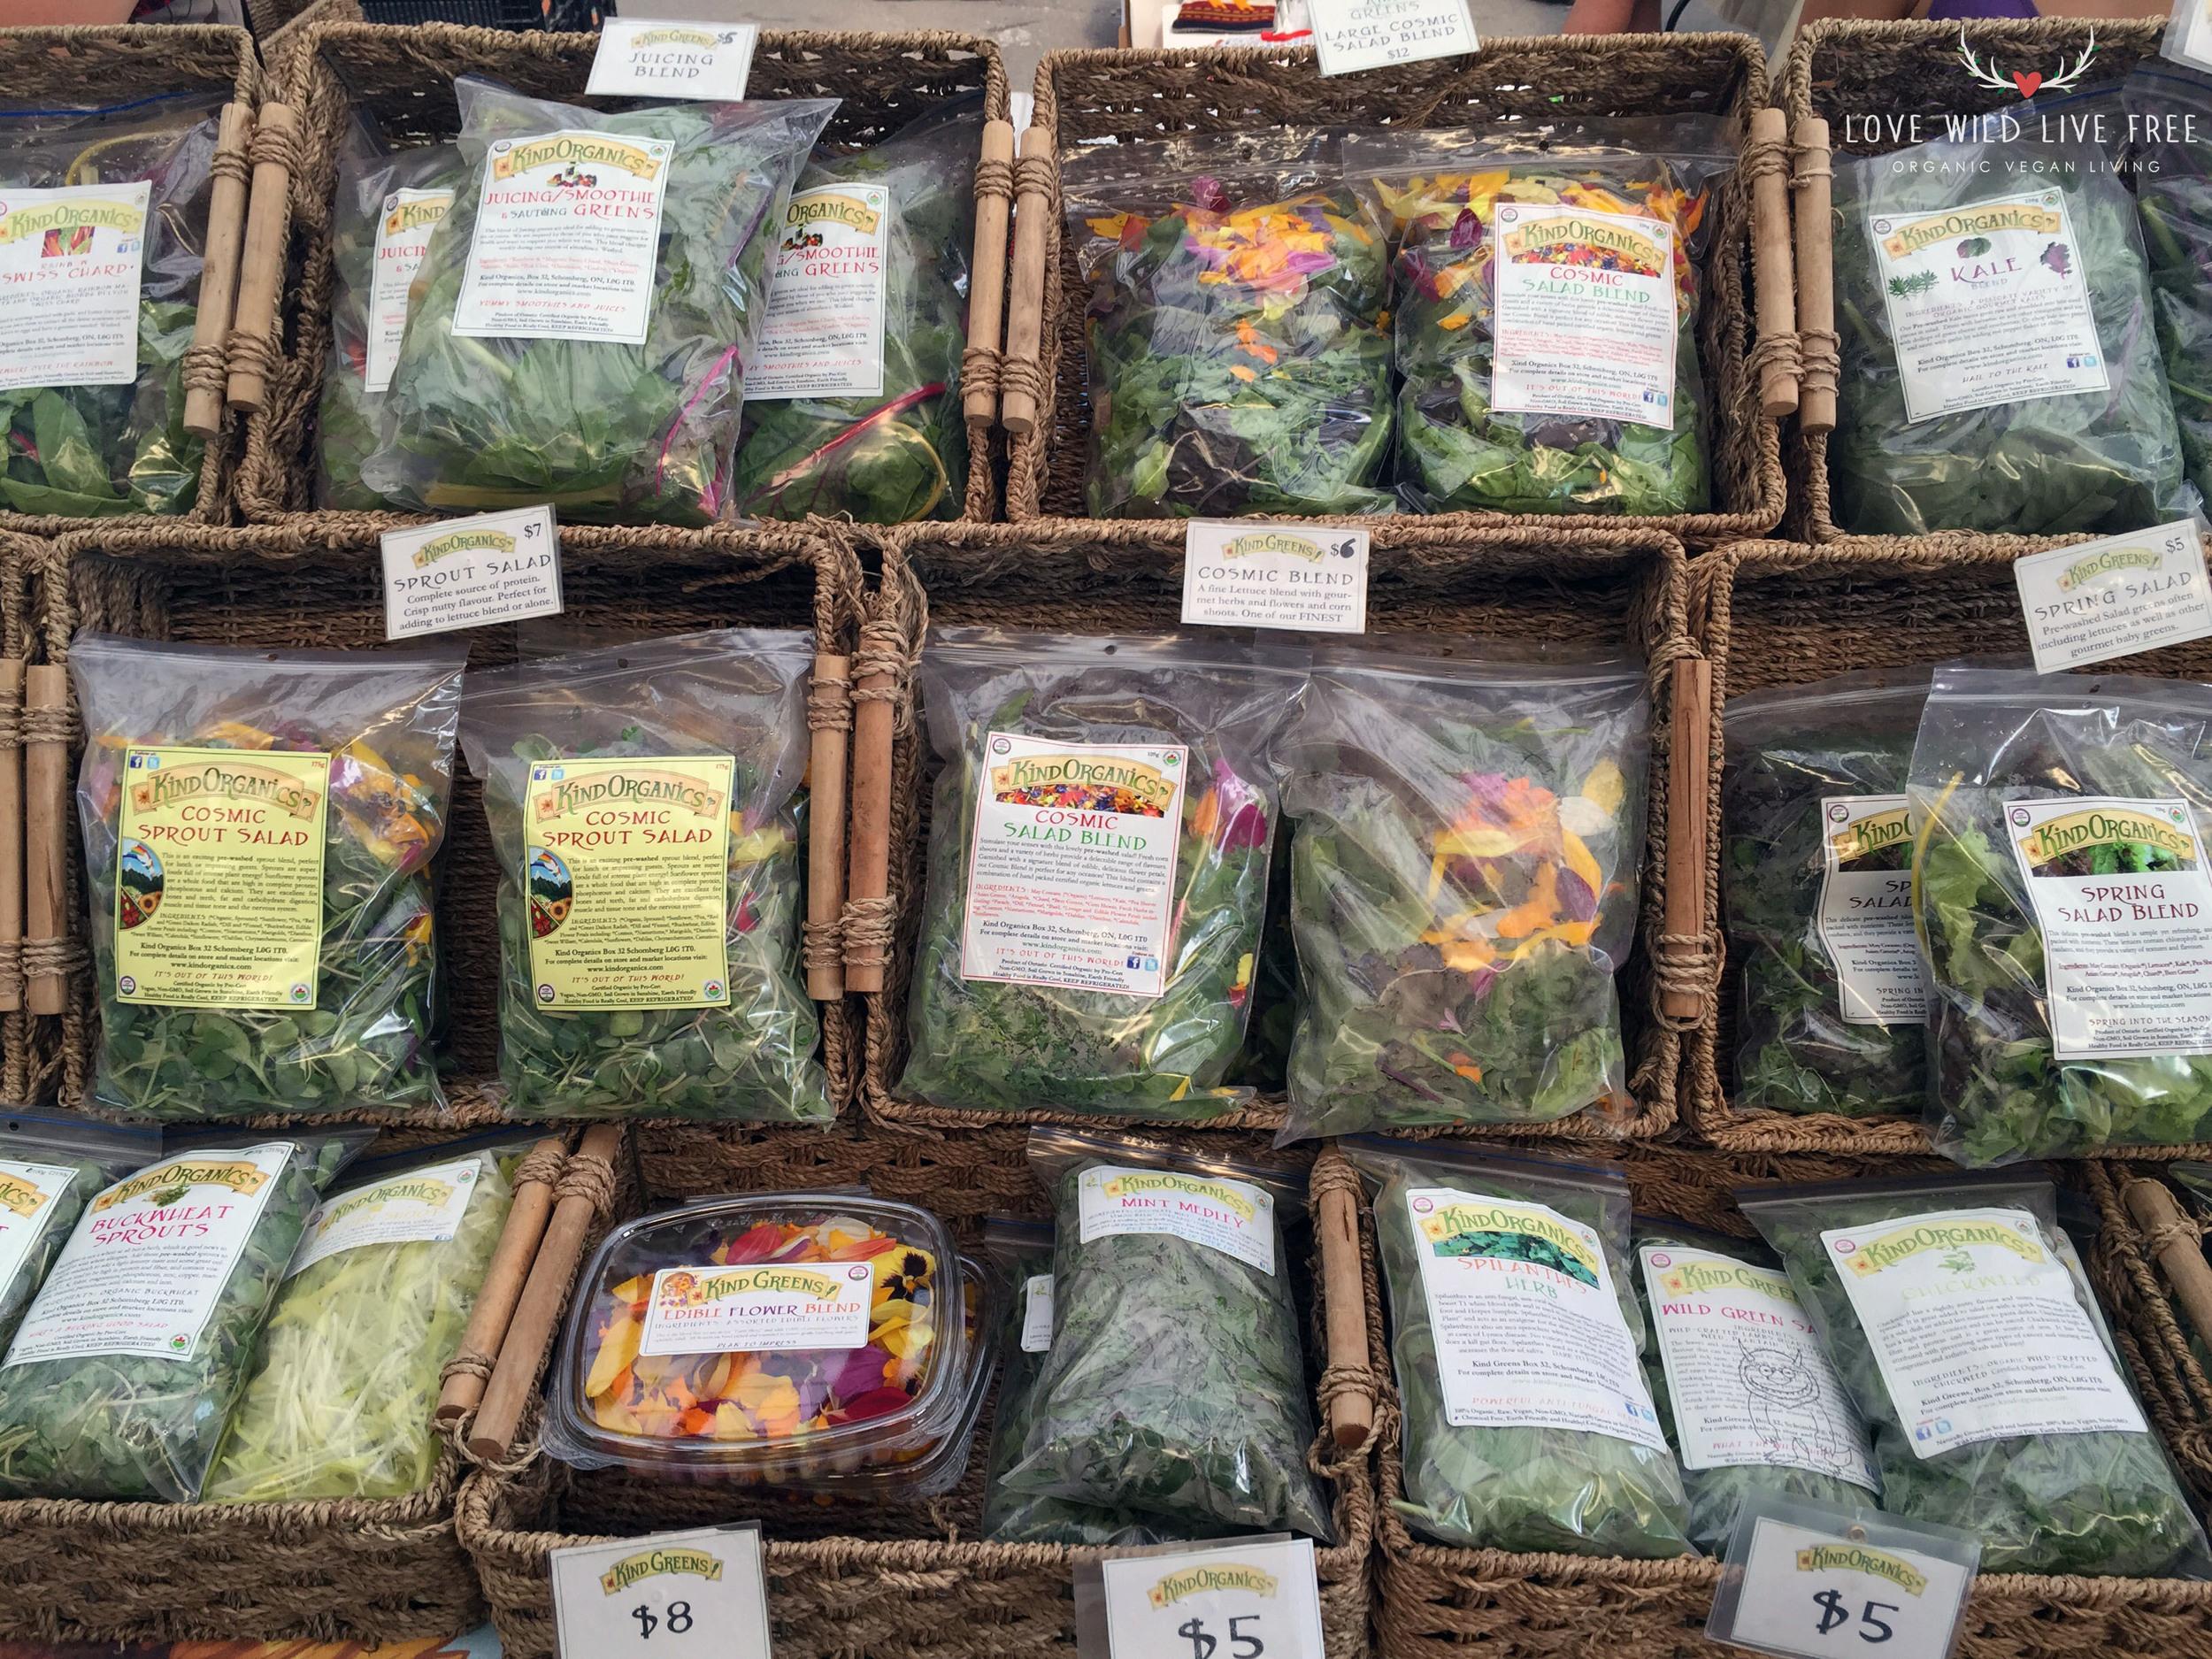 Kind Organics at Toronto's Evergreen Brick Works.  Photo by LoveWildLiveFree.